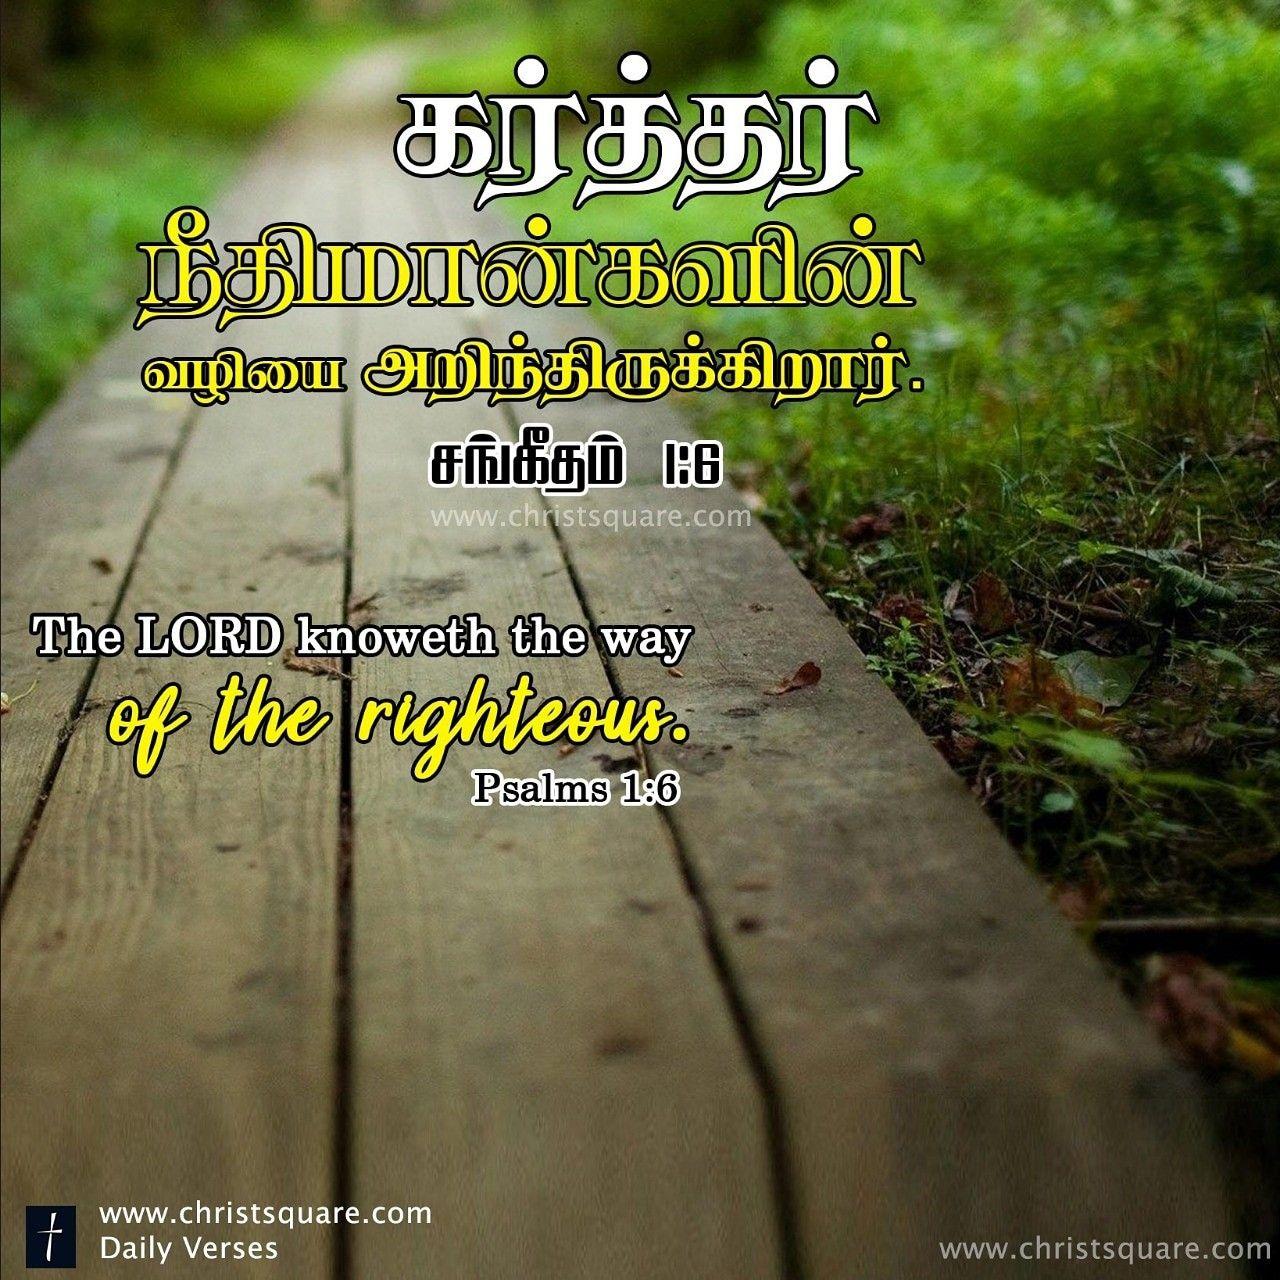 Tamil Christian Whatsapp Status Tamil Christian Whatsapp Dp Wallpaper Tamil Christian Wallpaper H Christian Verses Christian Wallpaper Hd Christian Wallpaper